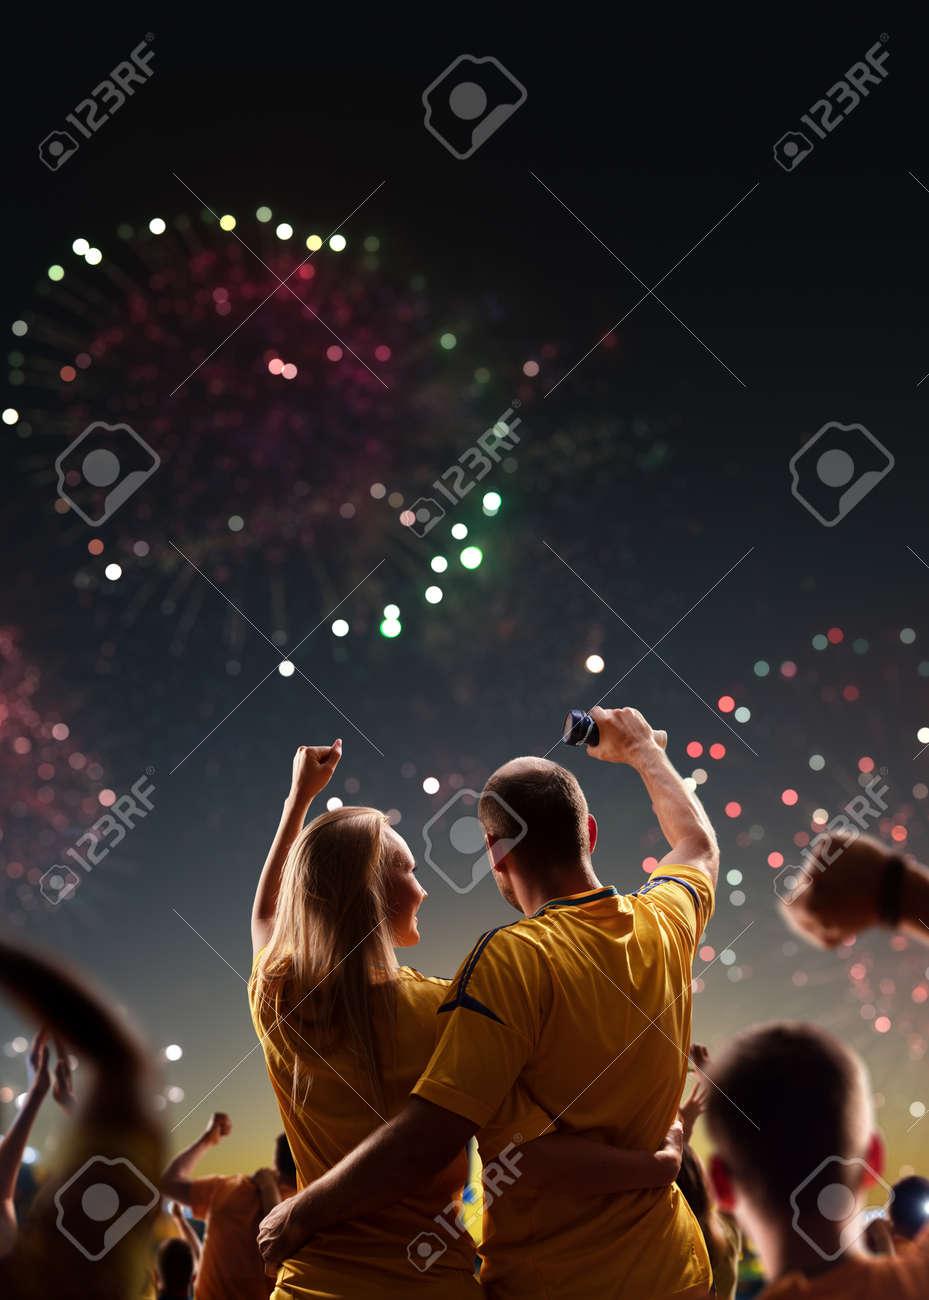 Fans celebrate in Stadium Arena night fireworks - 158199356